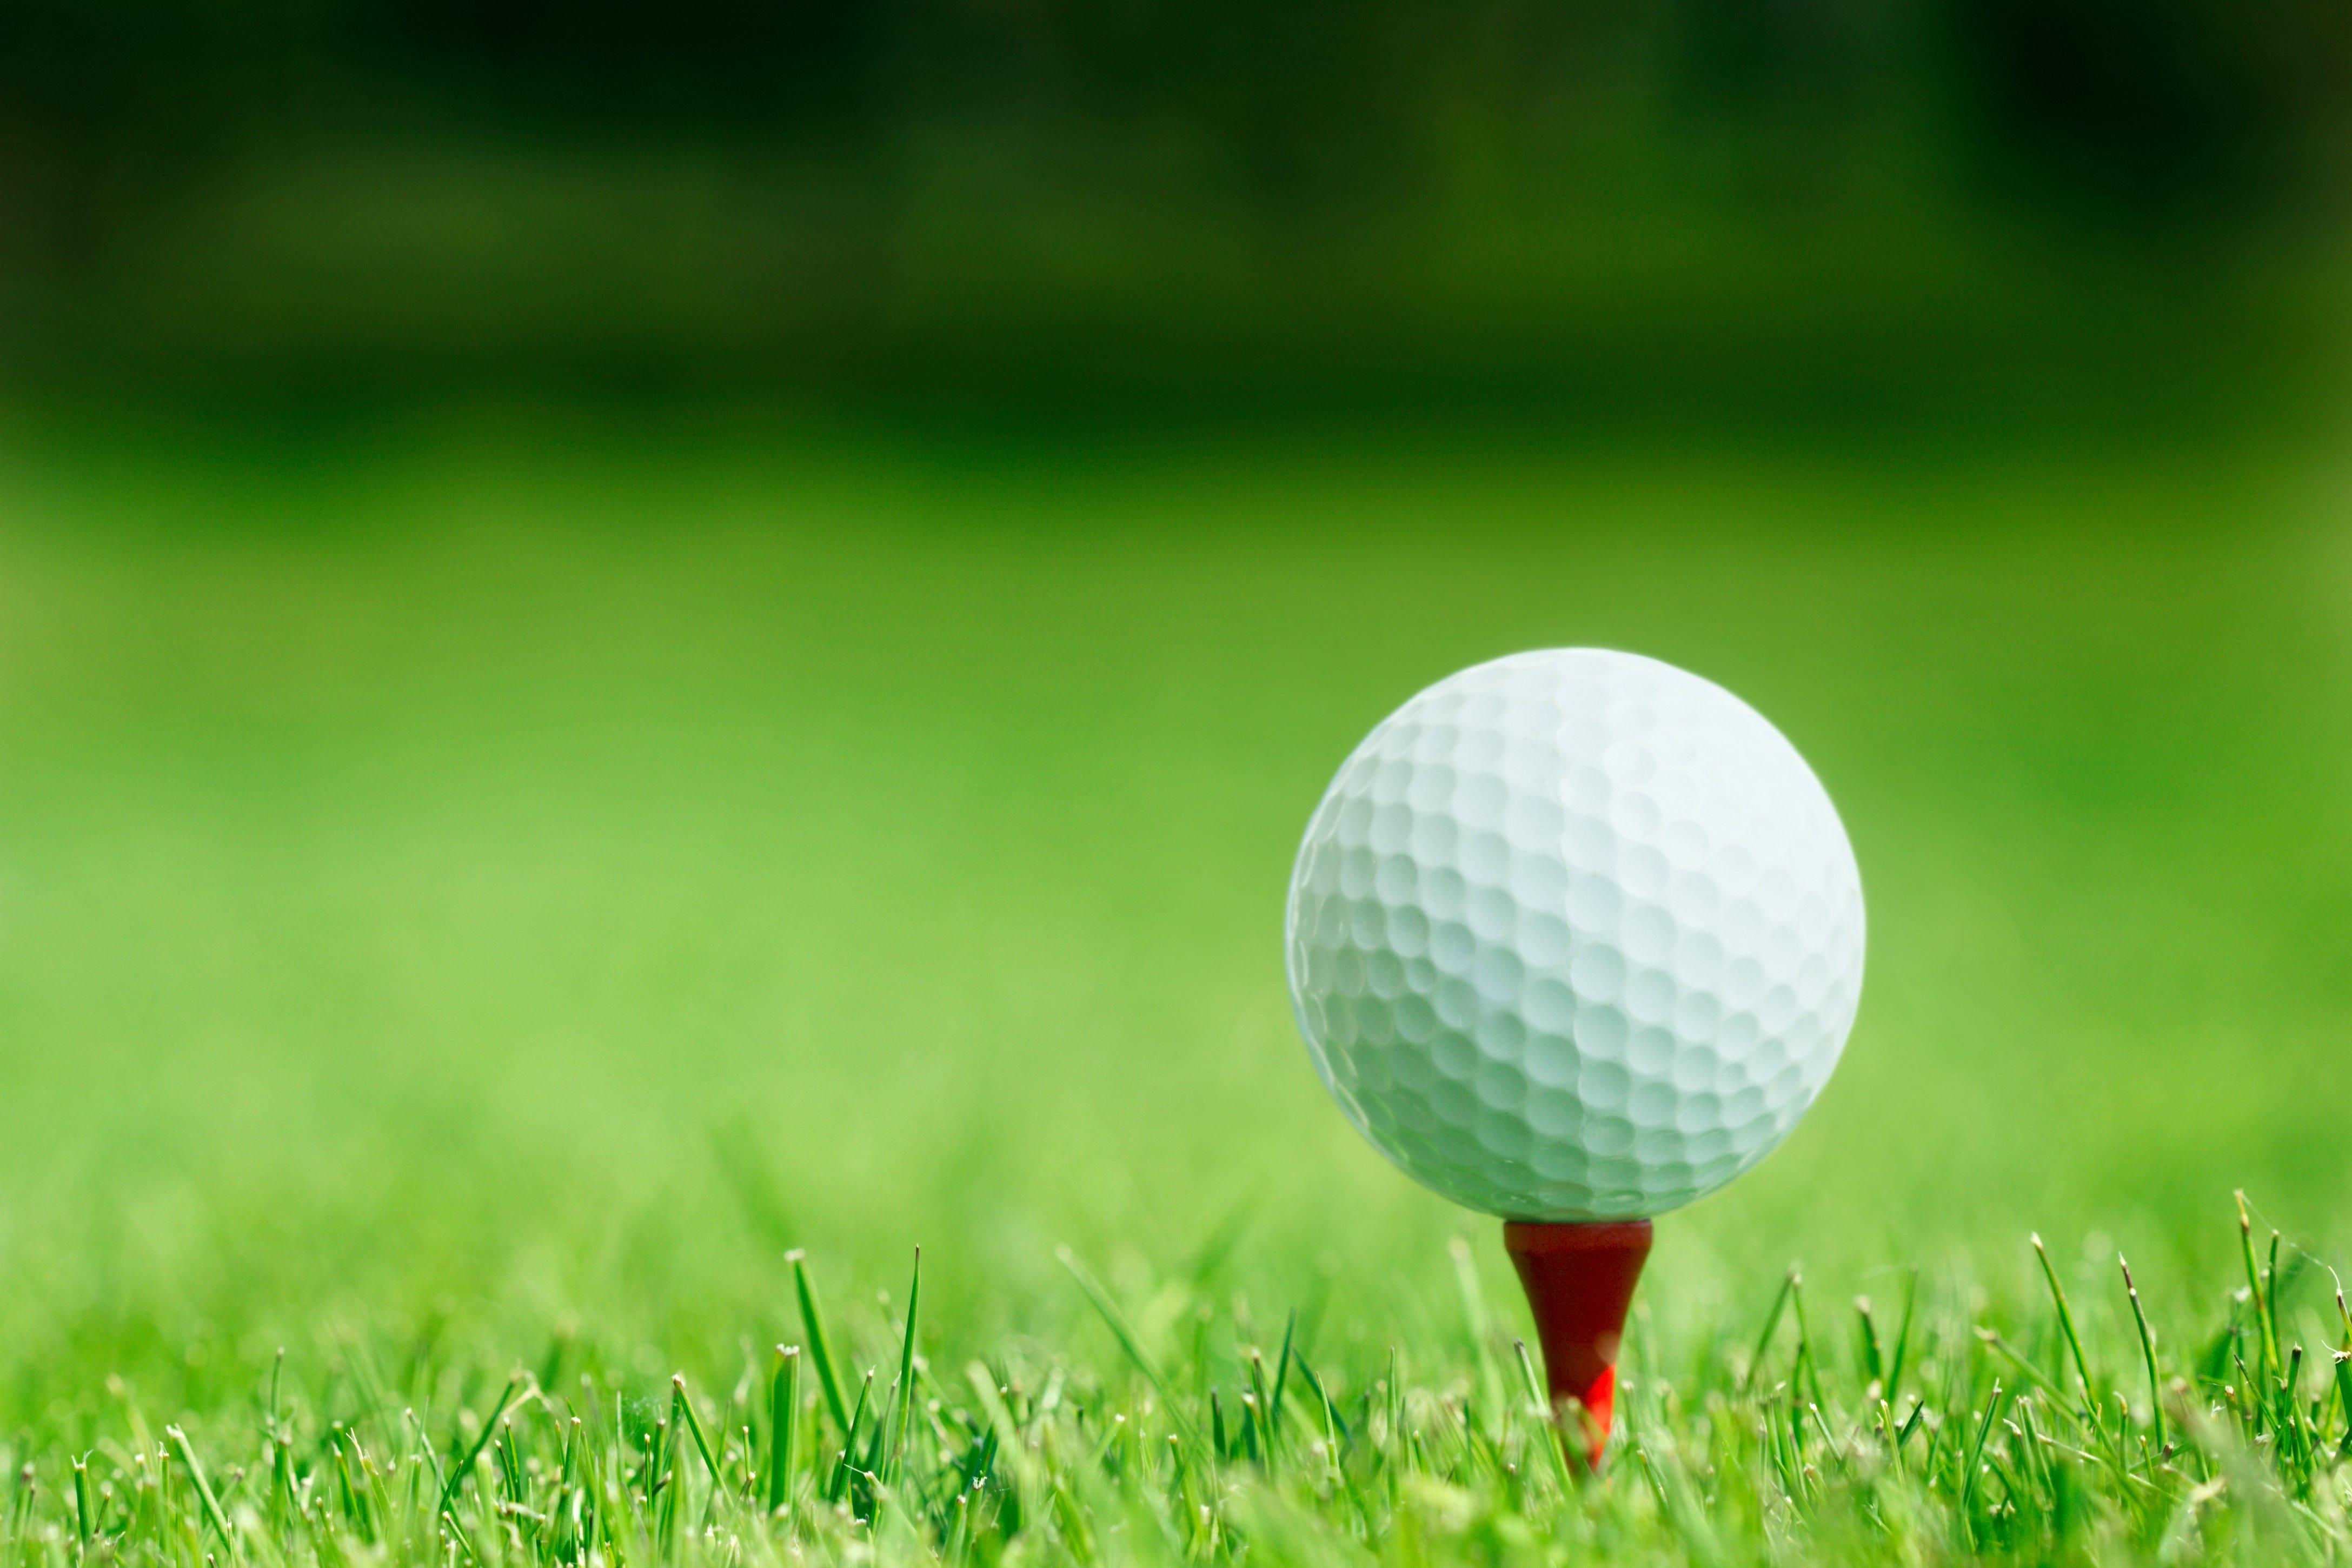 golf-ball-on-tee-AMAVSK4